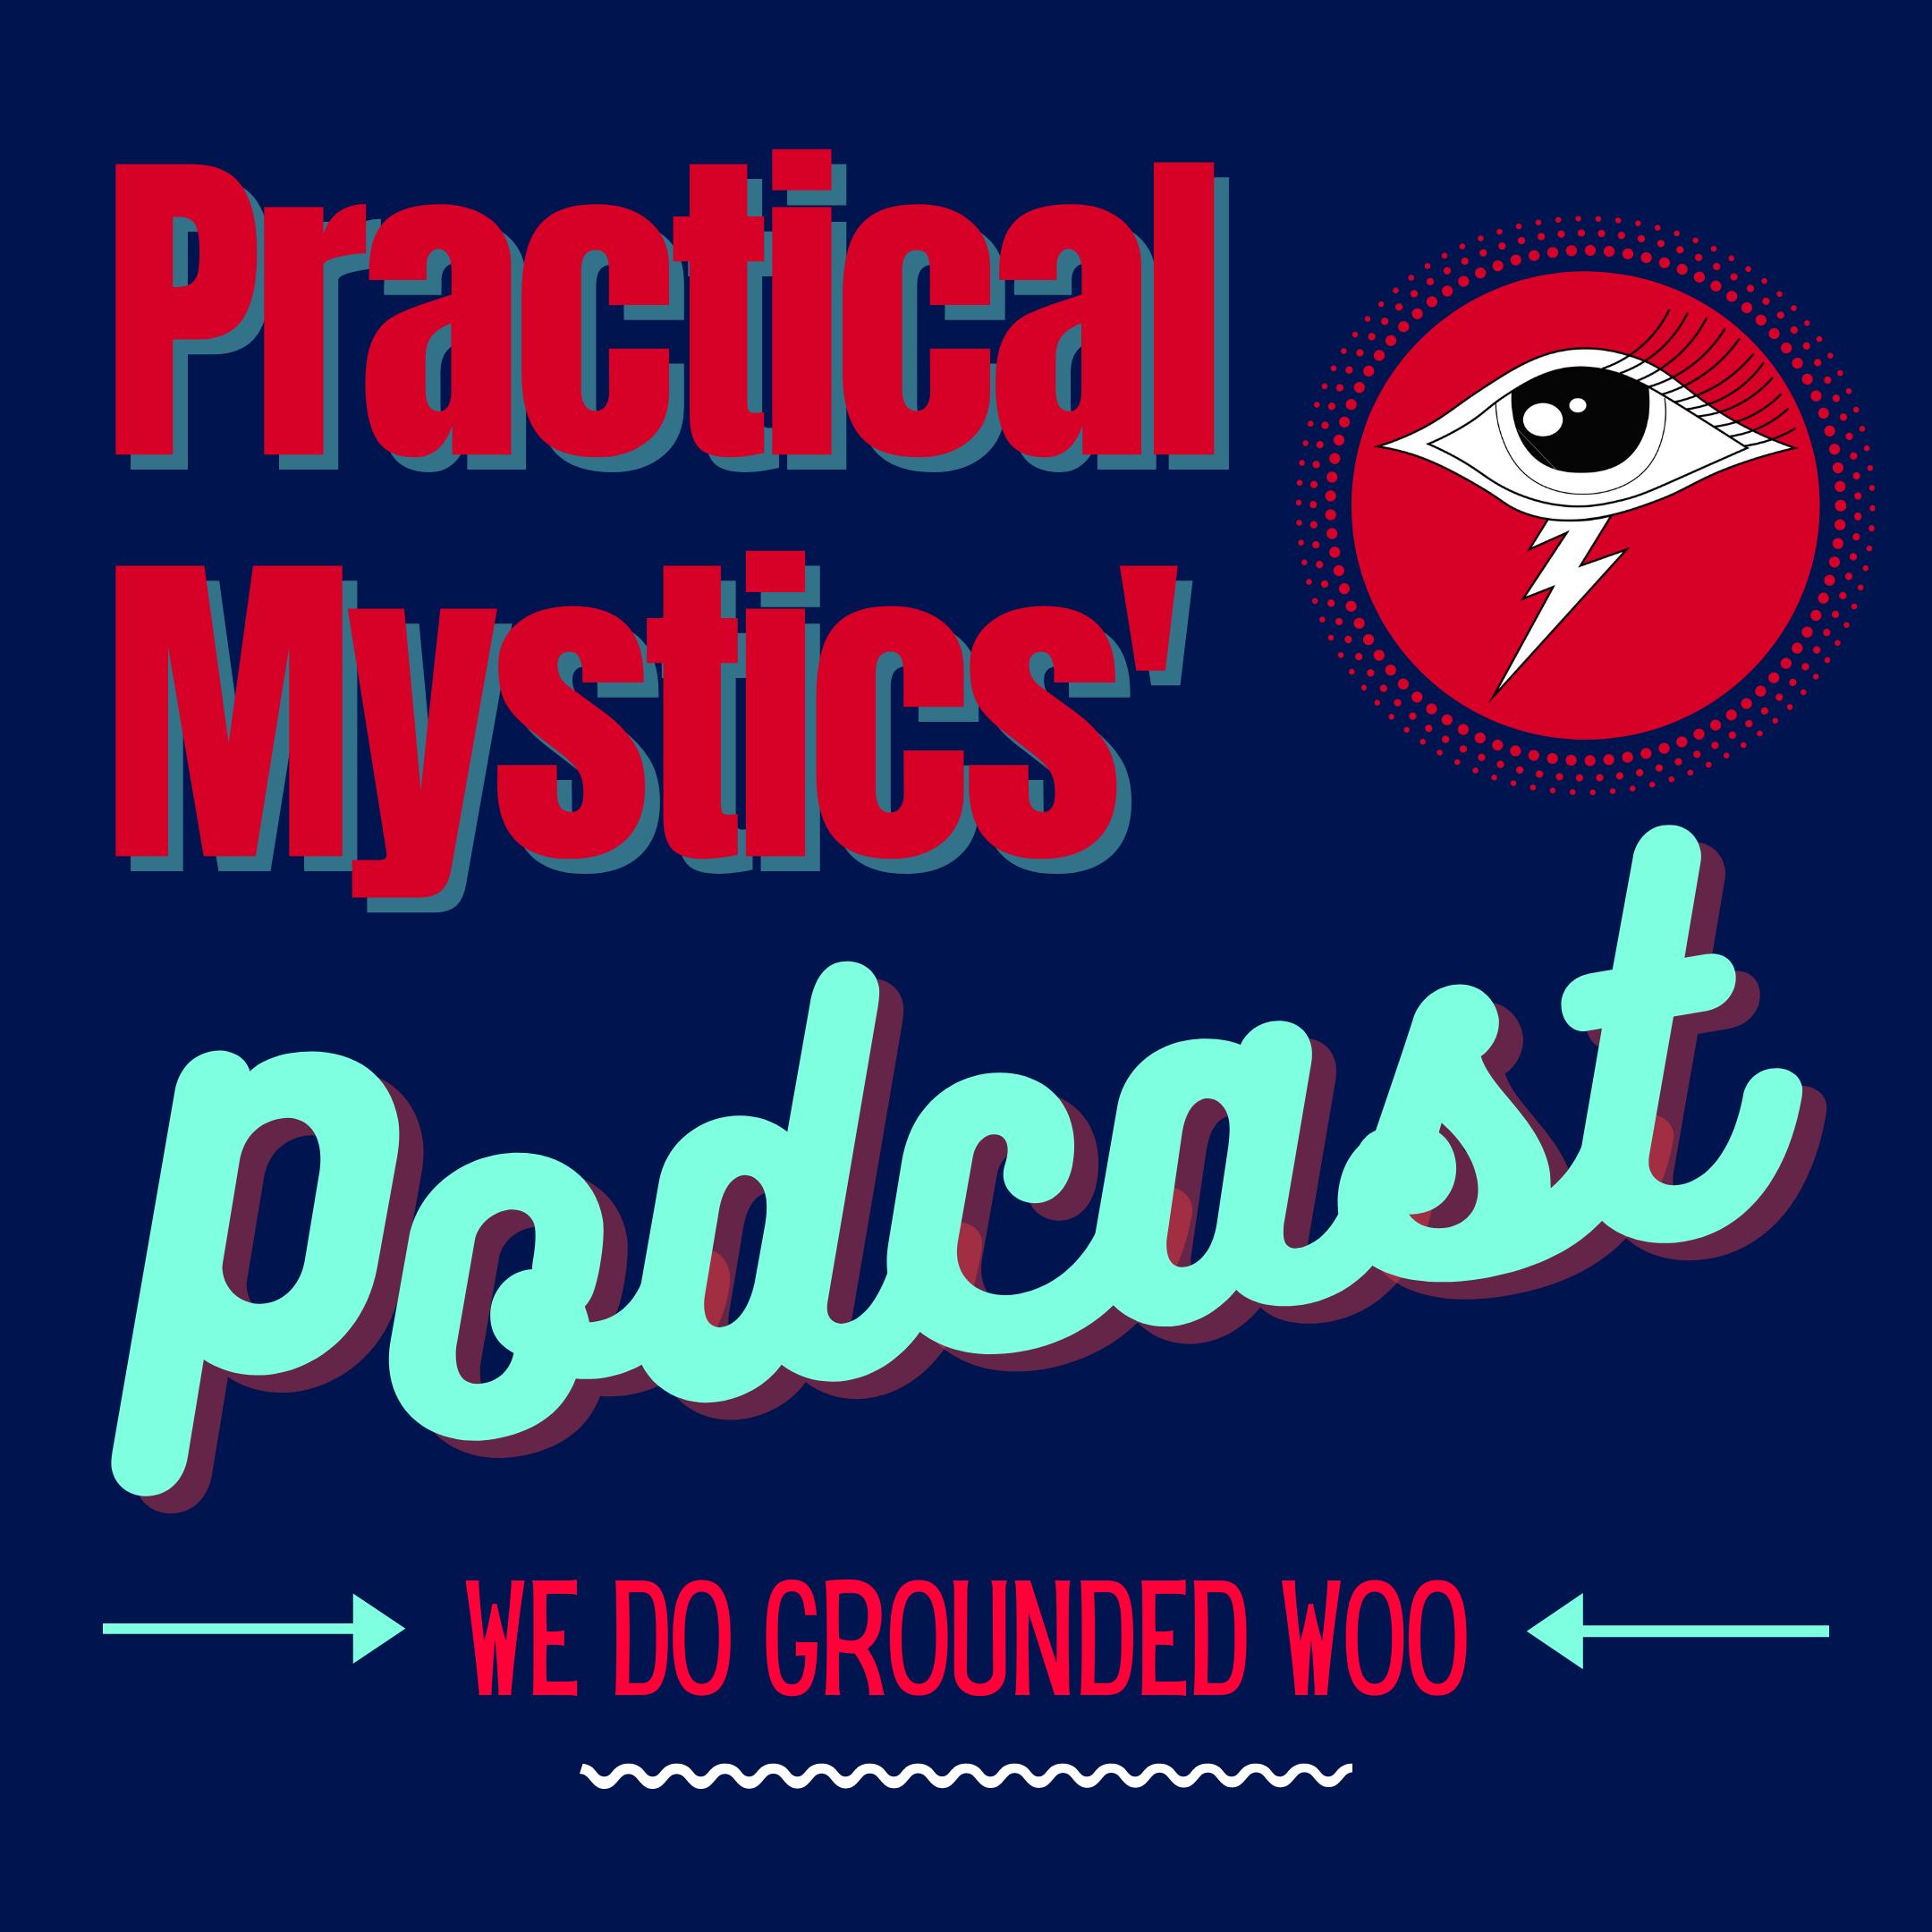 Practical Mystics' Podcast show art